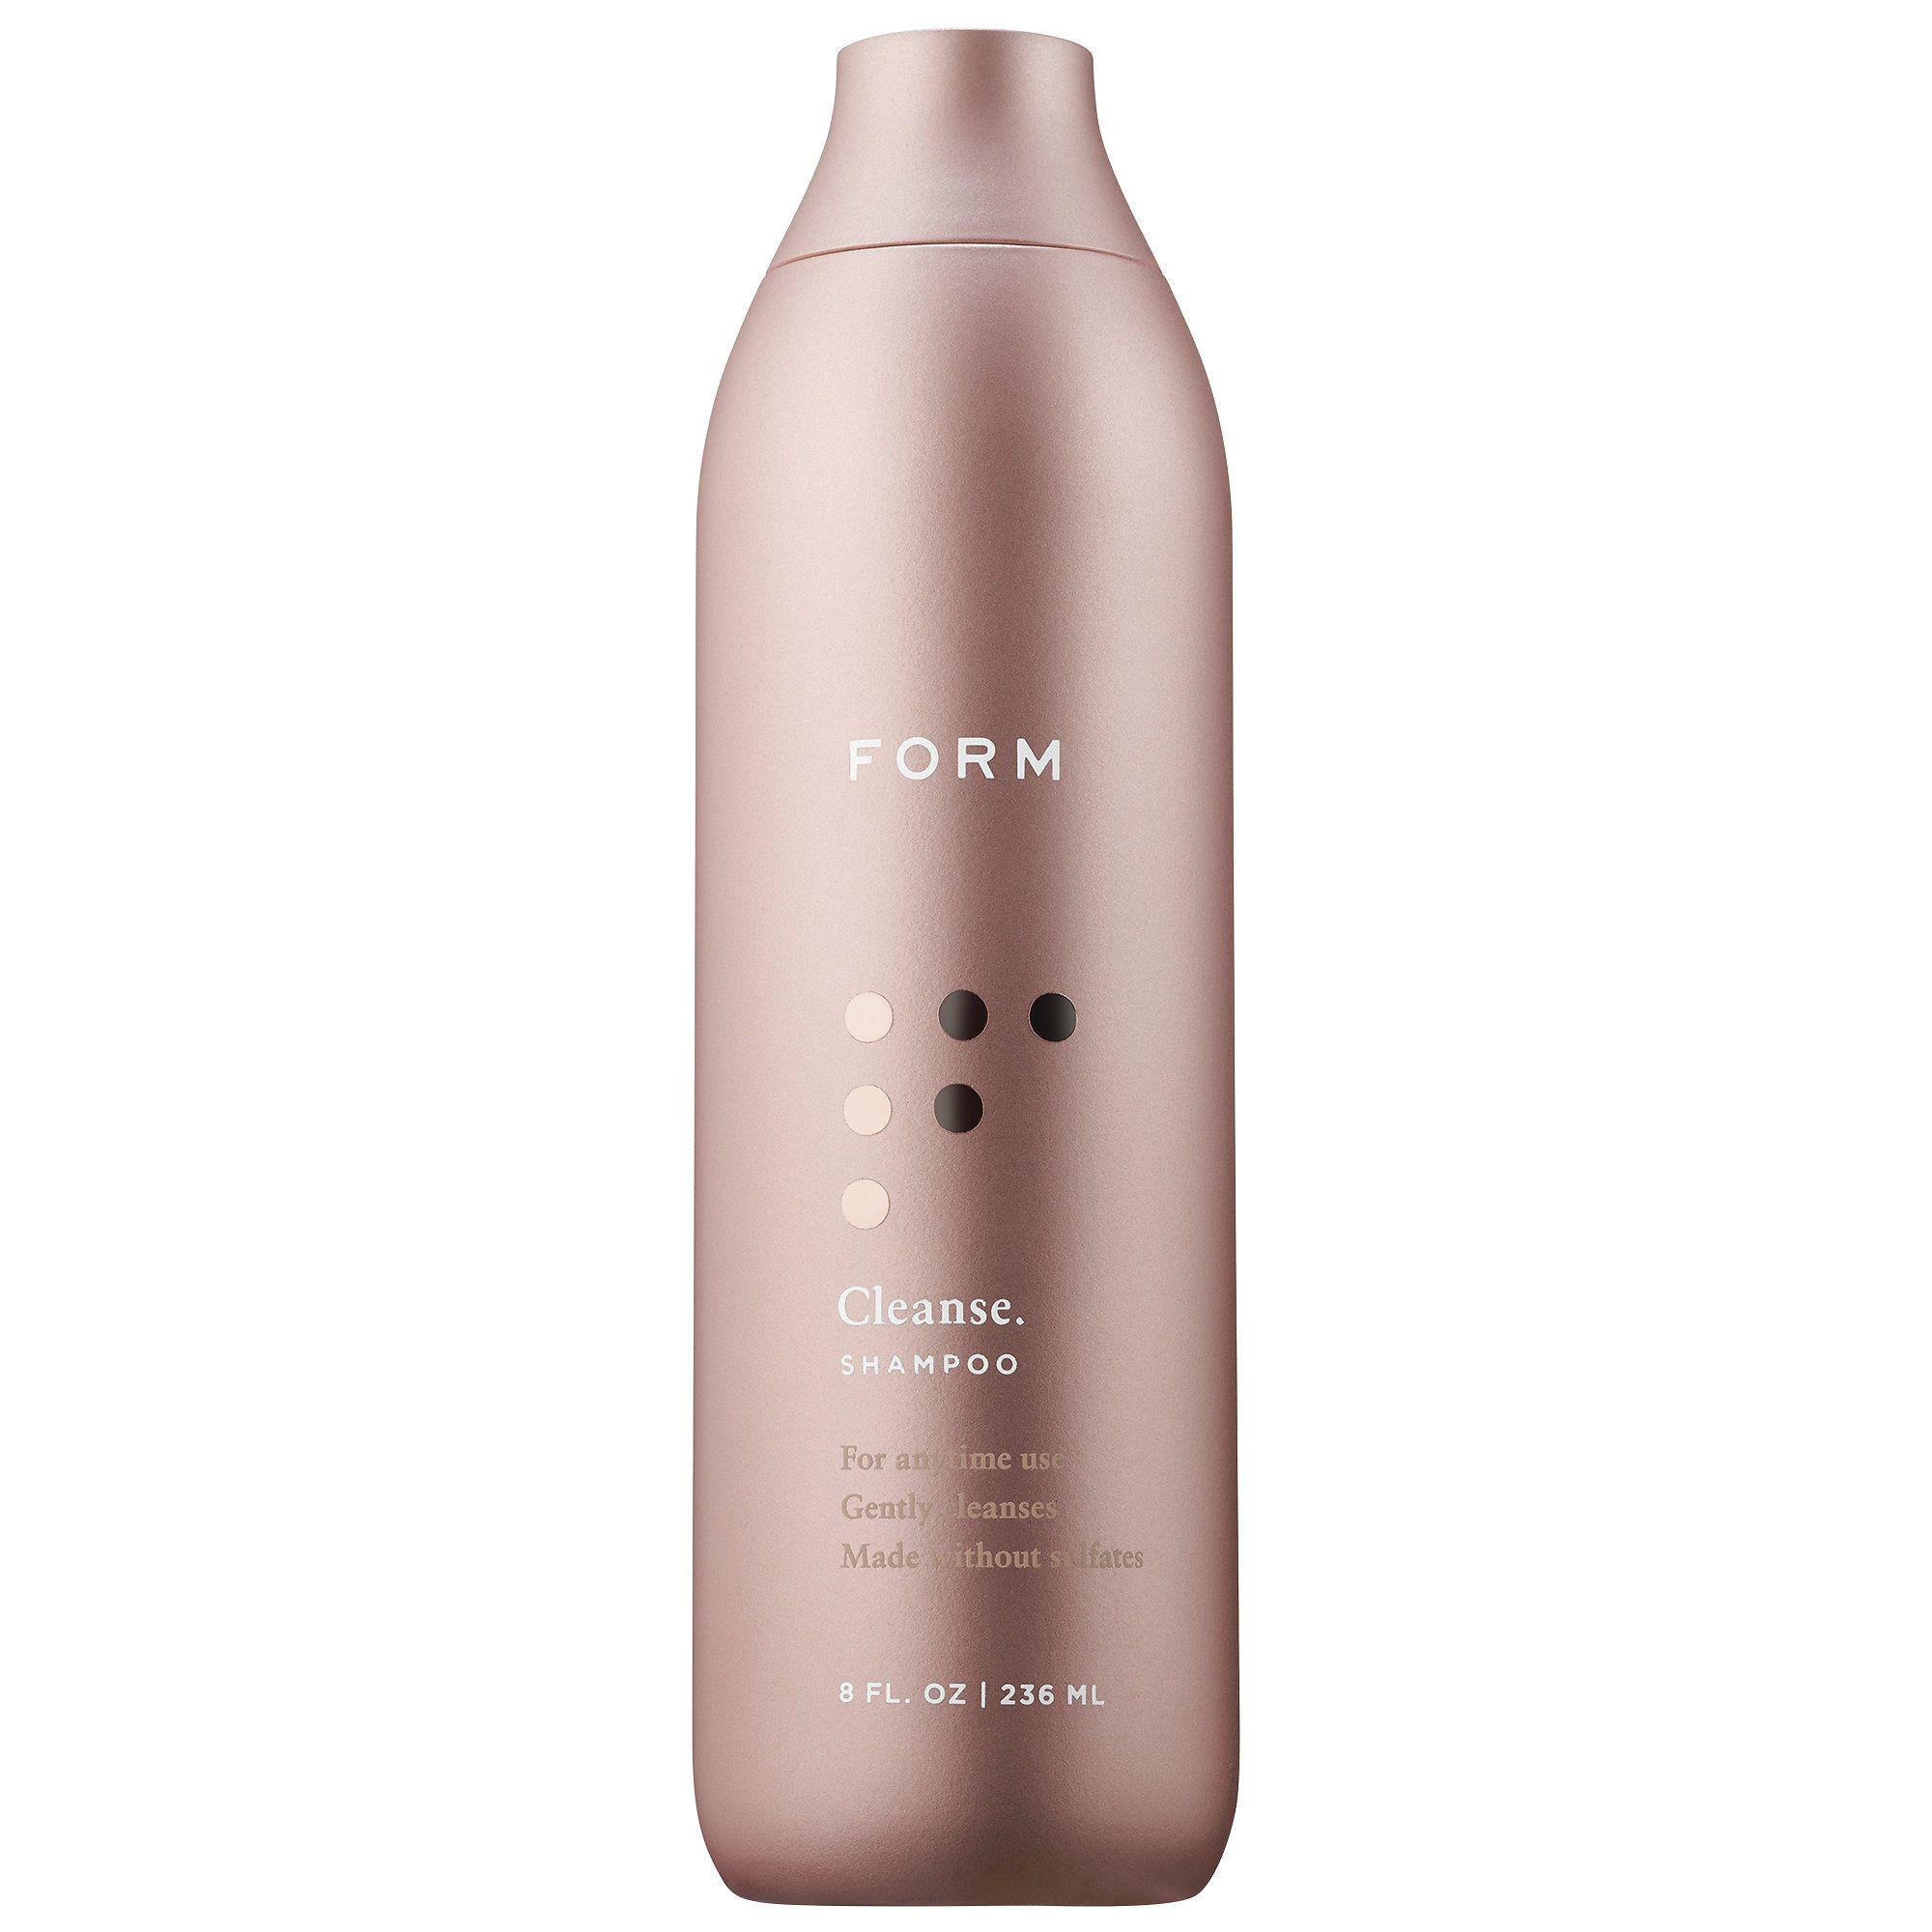 Cleanse shampoo shampoo salon shampoo brands salon